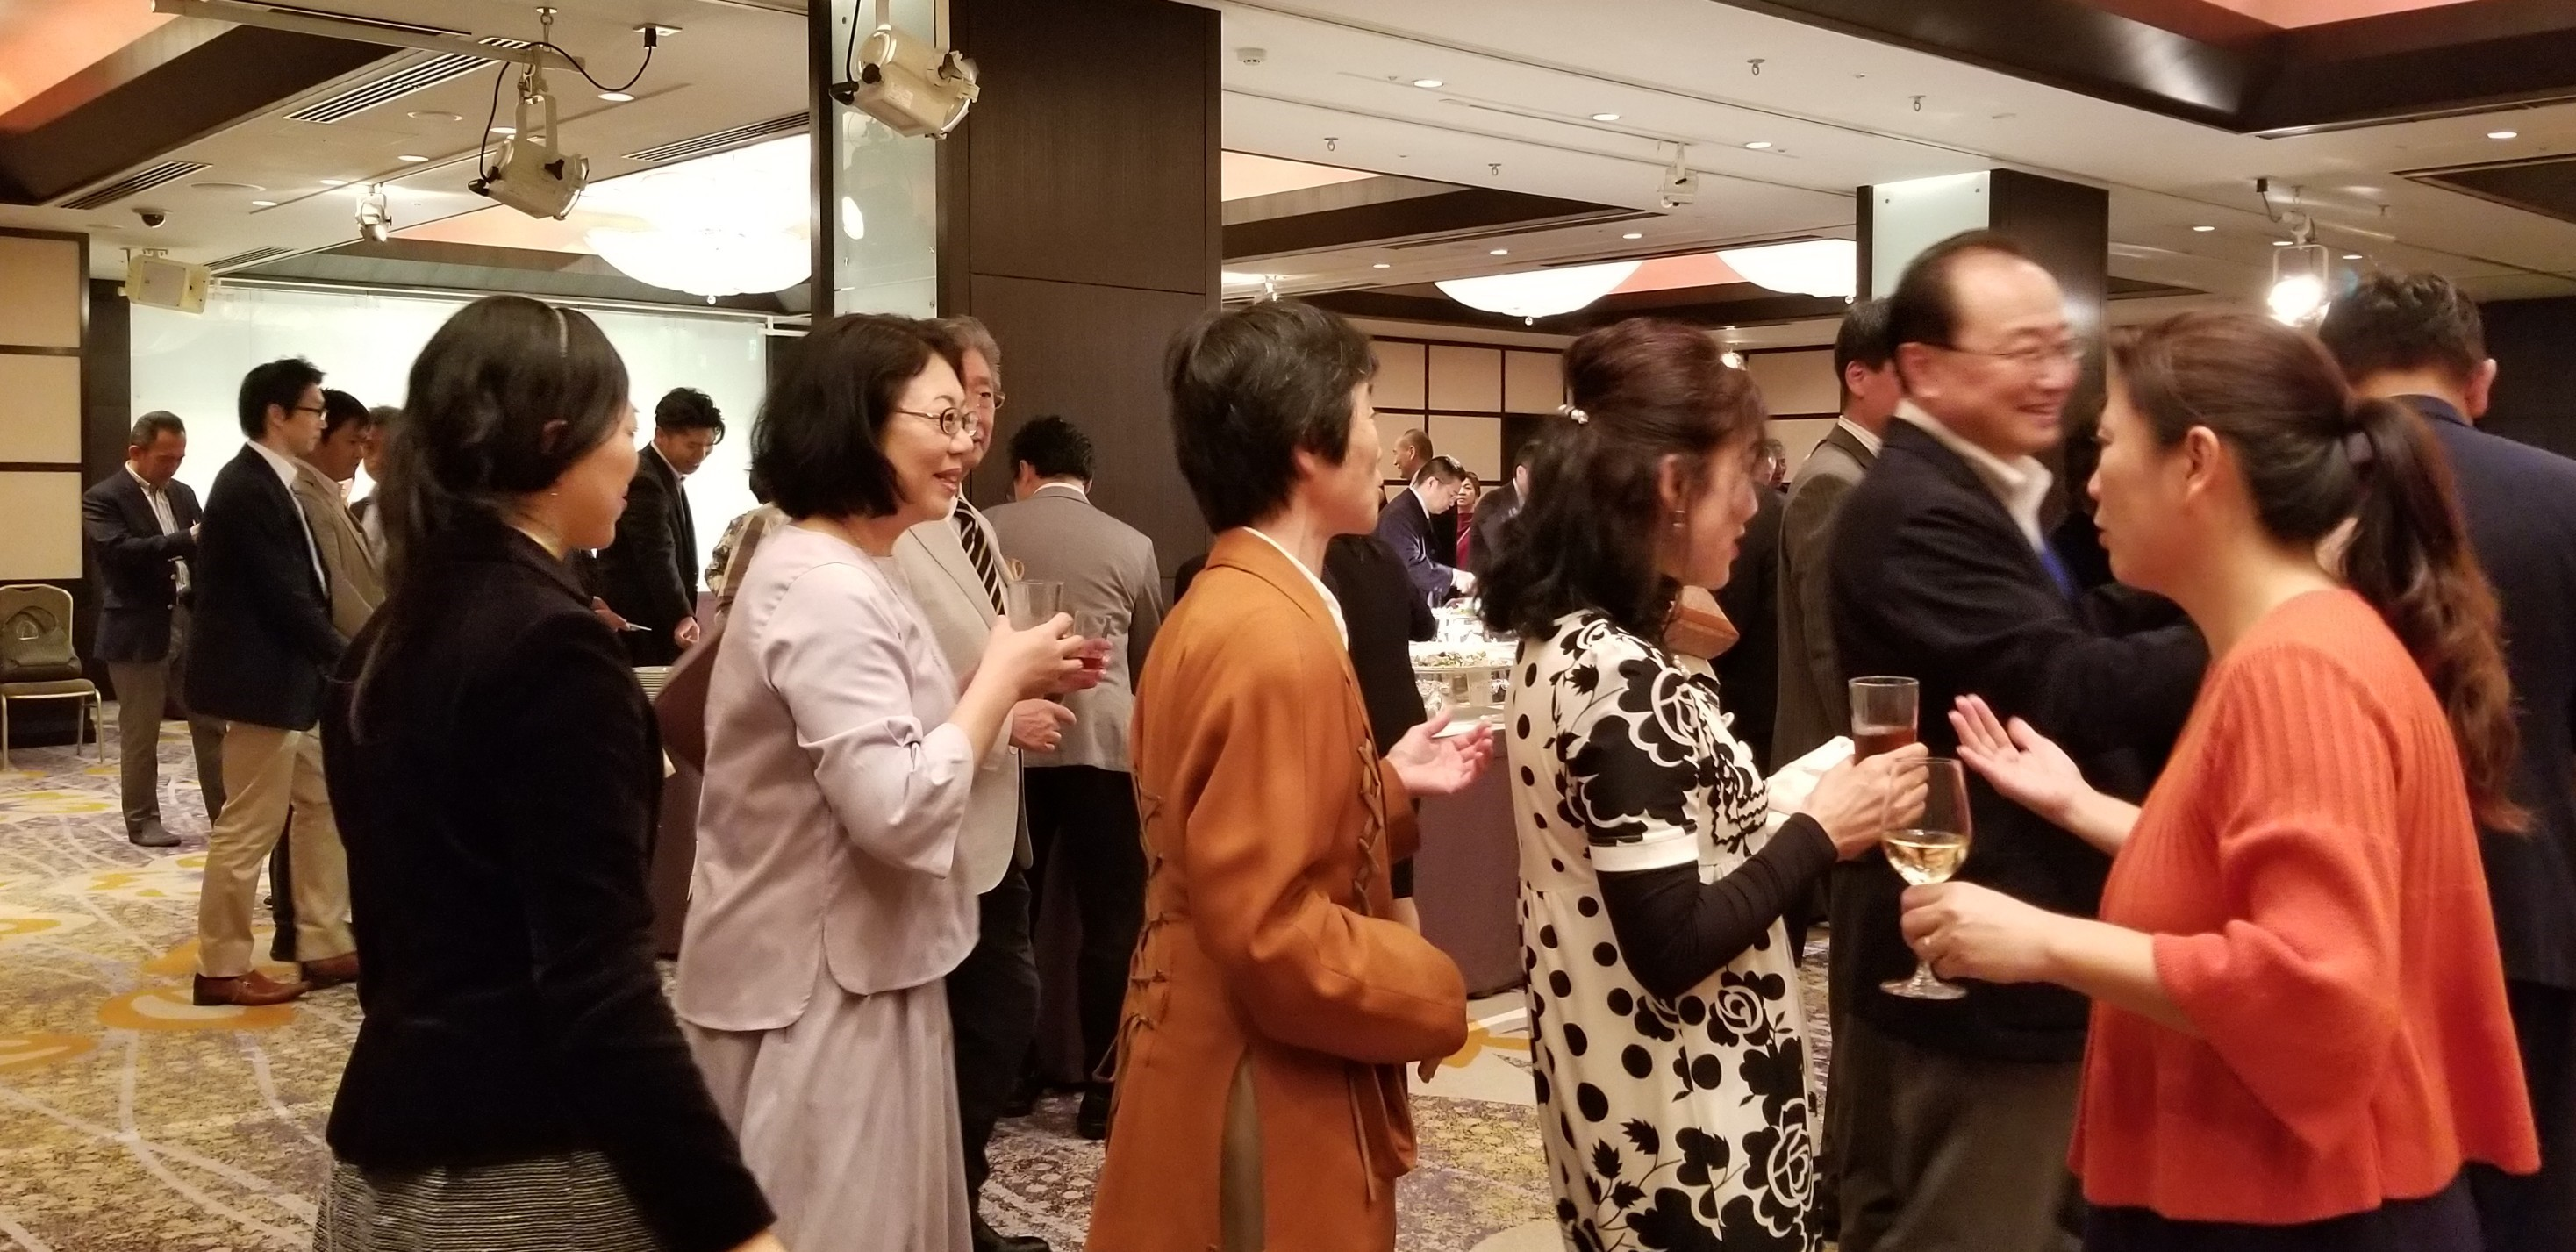 ed6a83f29ef037c5116648db64b2e1a1 - 第6回思風会全国大会2018in東京開催